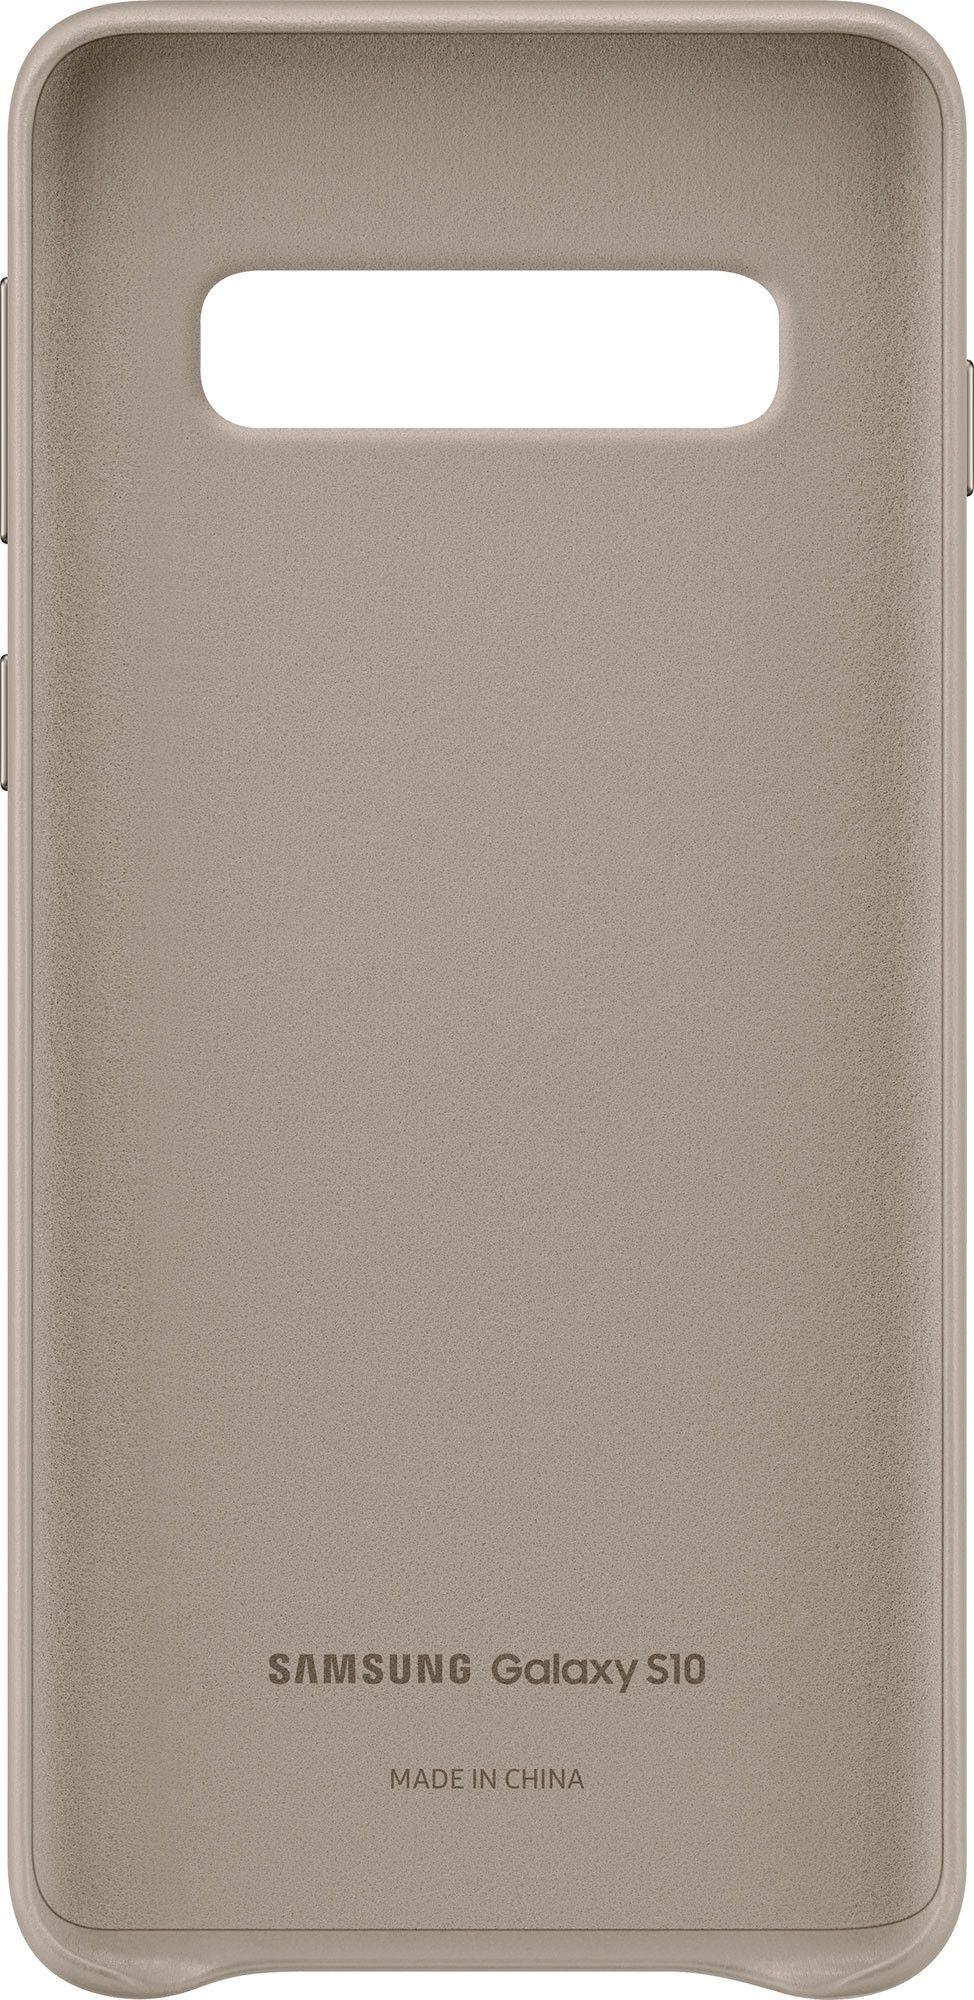 Панель Samsung Leather Cover для Samsung Galaxy S10 (EF-VG973LJEGRU) Gray от Територія твоєї техніки - 4